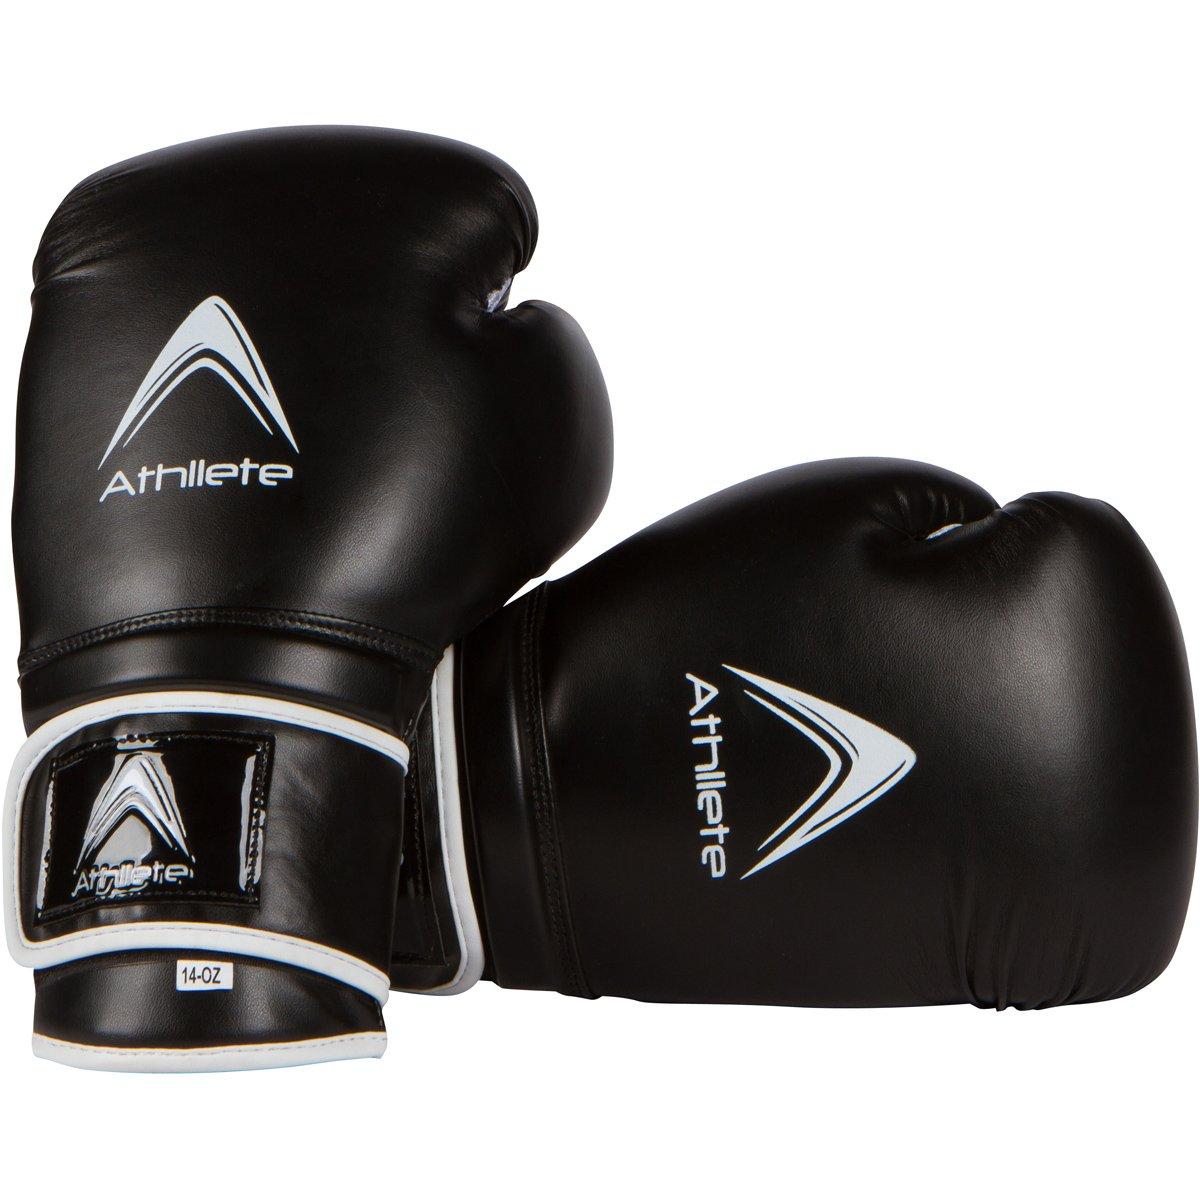 Kickboxing Training Gloves Athllete Training Boxing Gloves MMA Muay Thai Sparring Kickboxing Gloves Mixed Martial Arts Heavy Bag Gloves